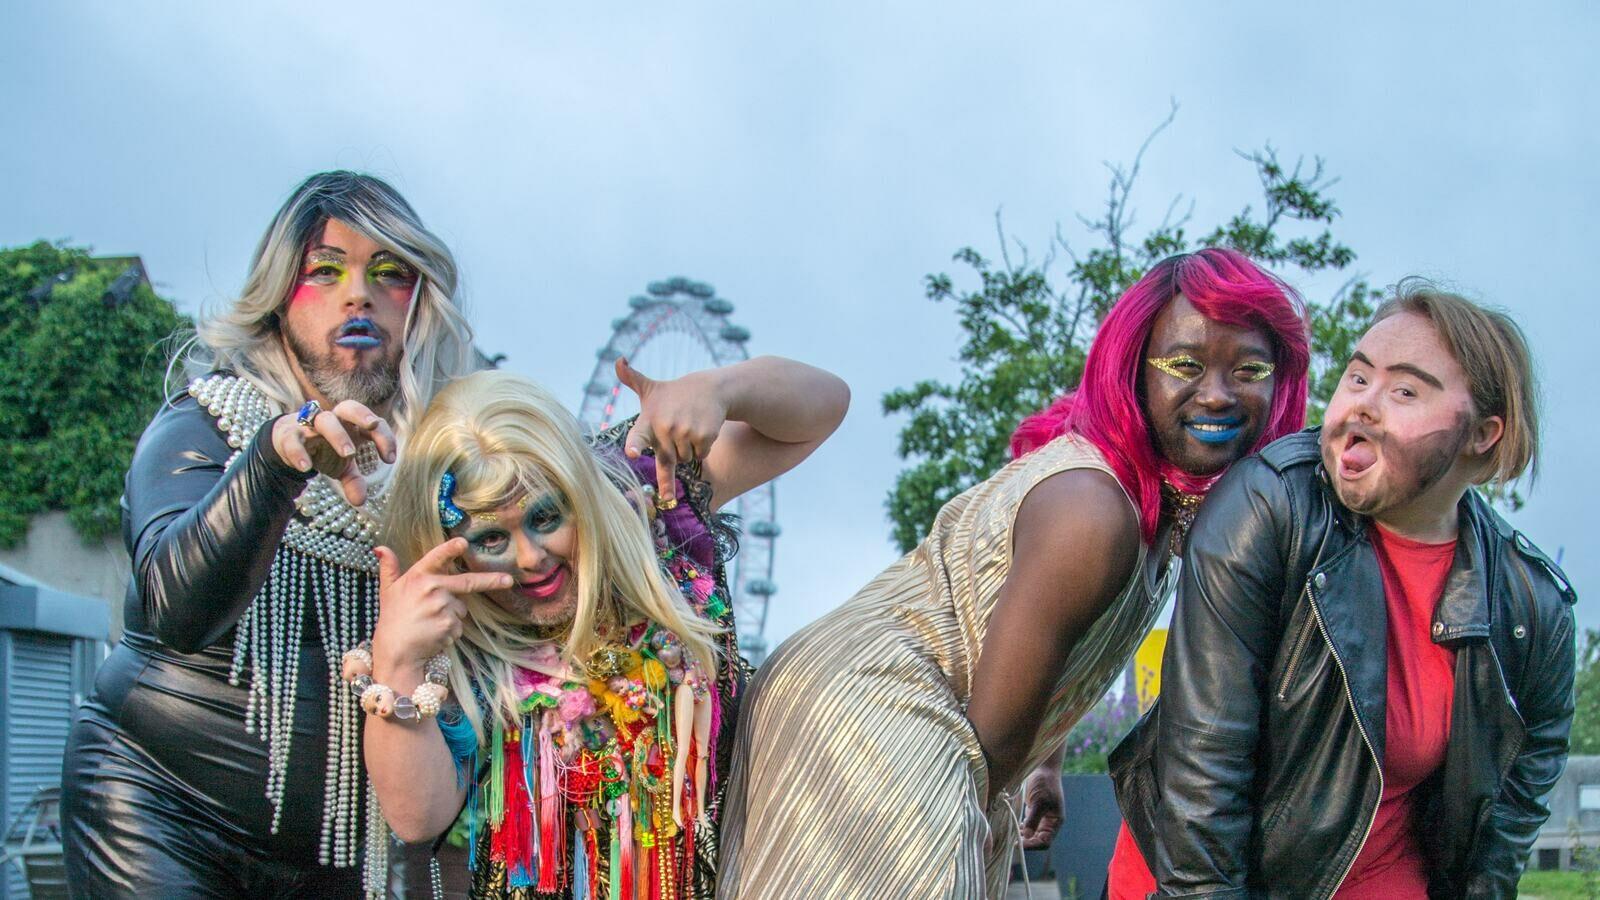 gender-bender-festival